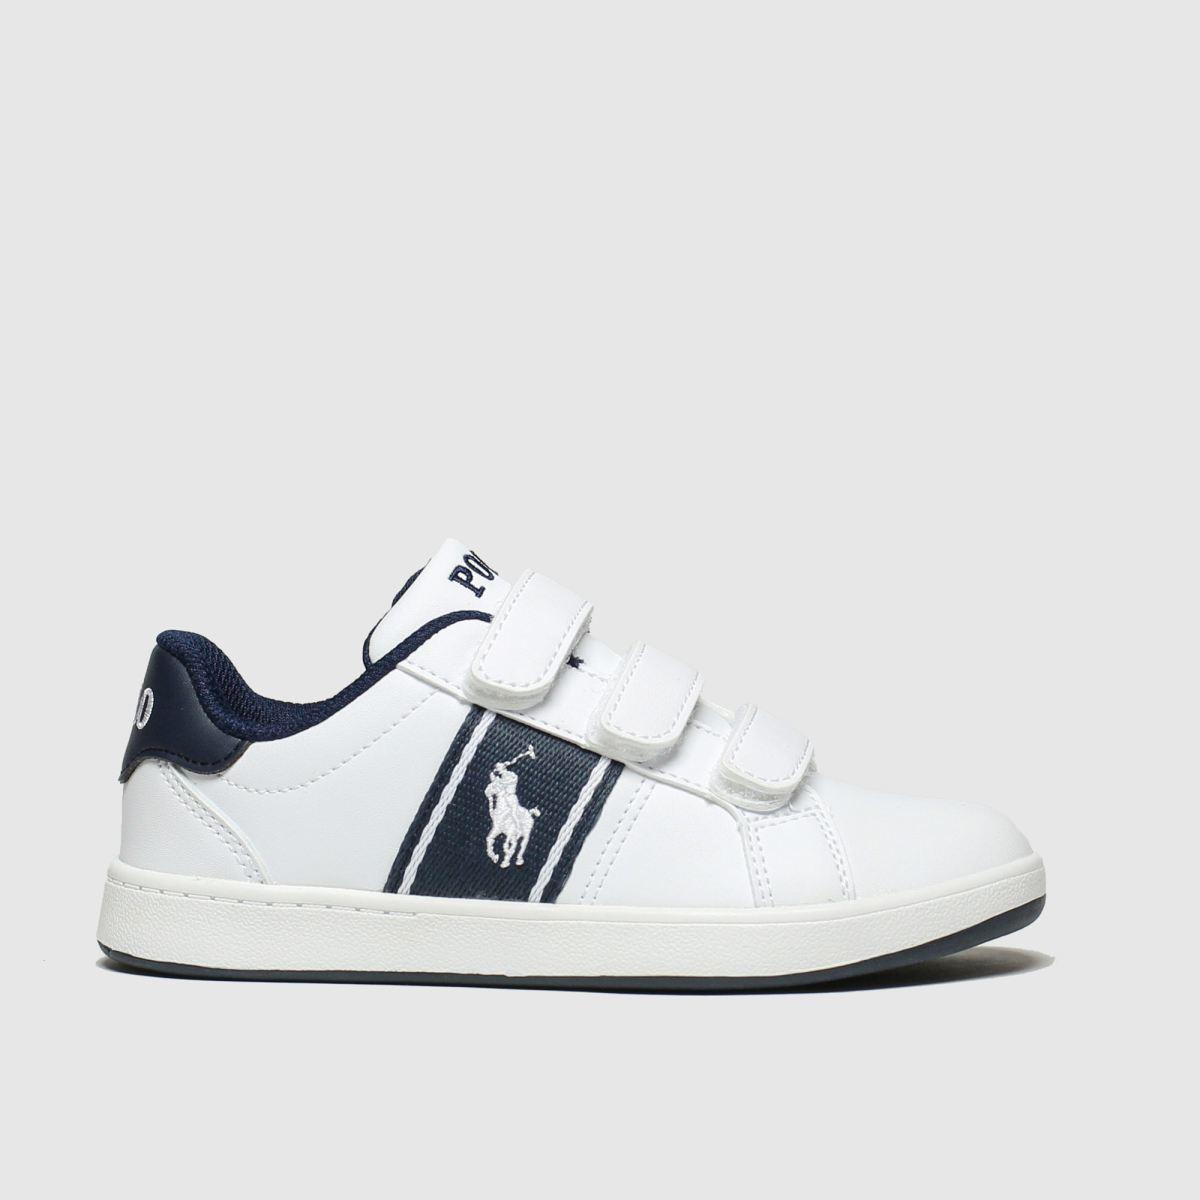 Polo Ralph Lauren White & Navy Quigley 3v Boots Junior